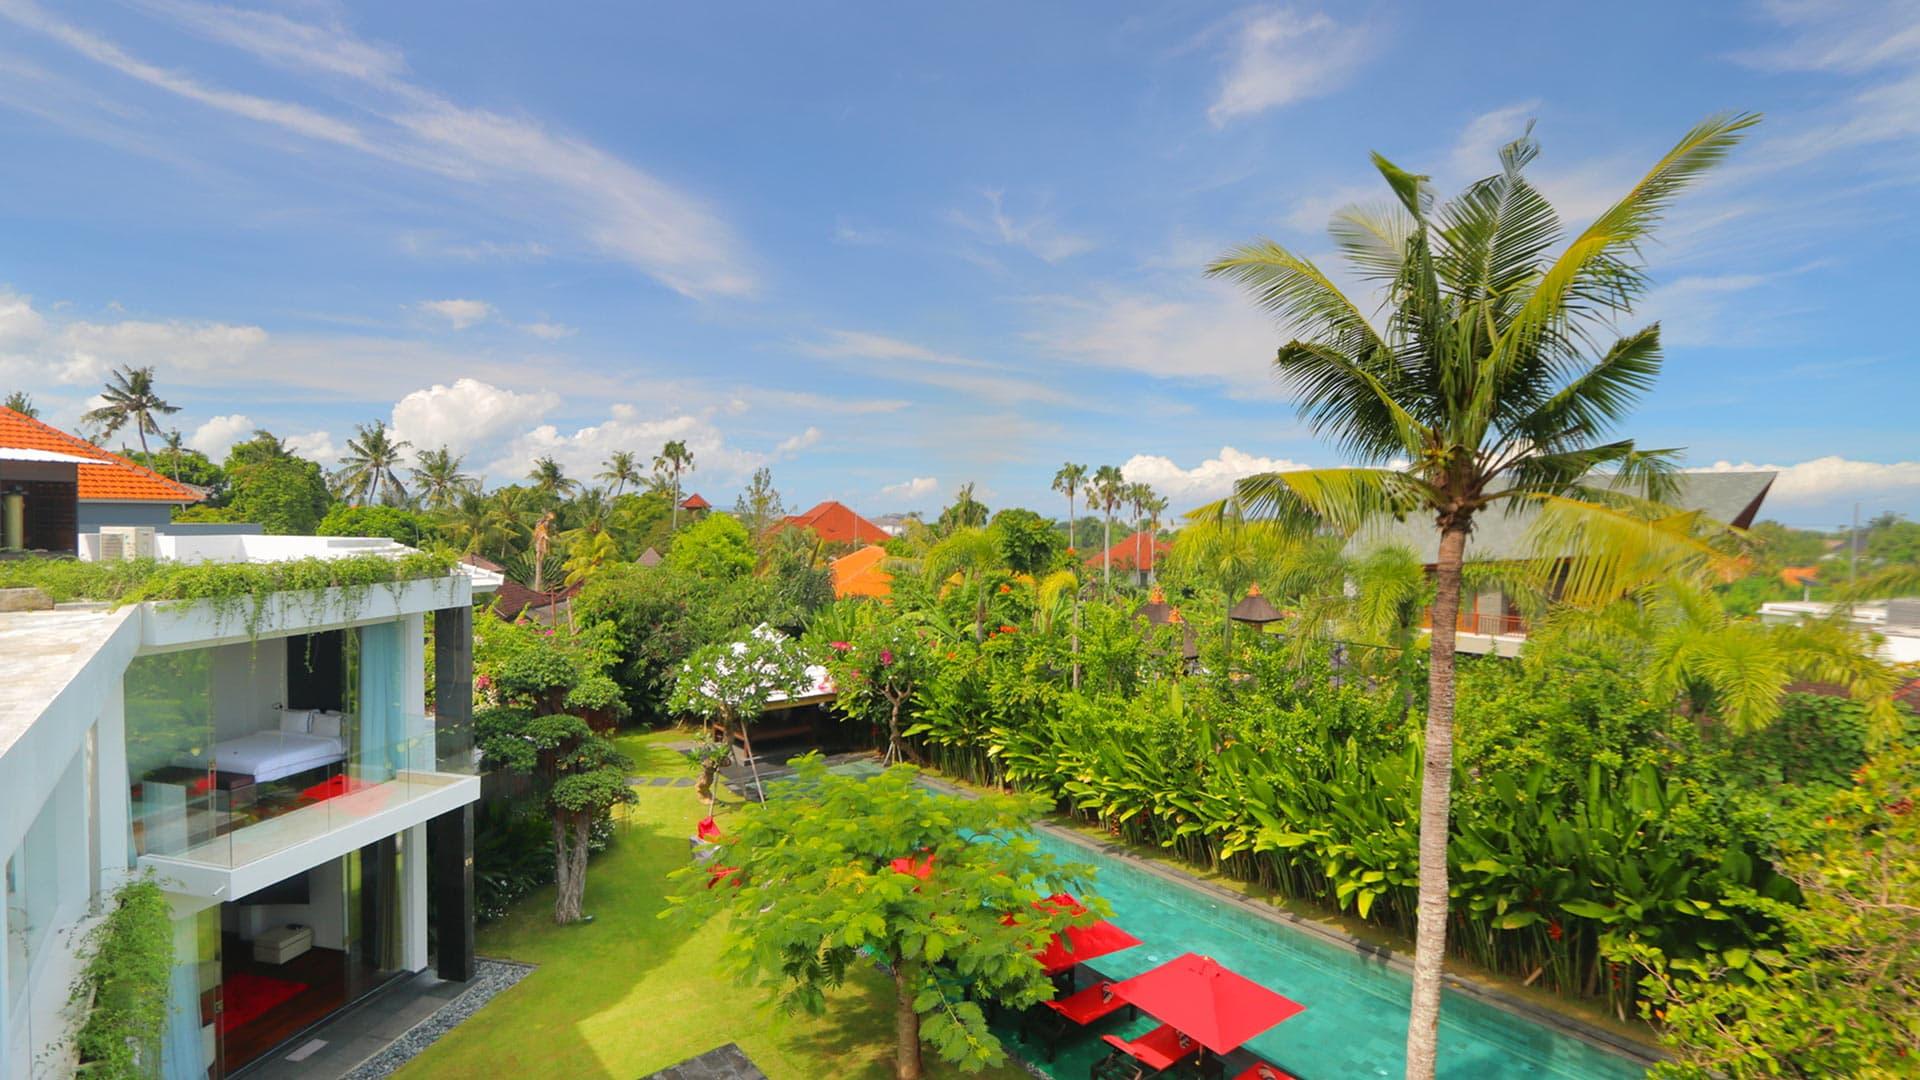 Villa Villa Abby, Rental in Bali